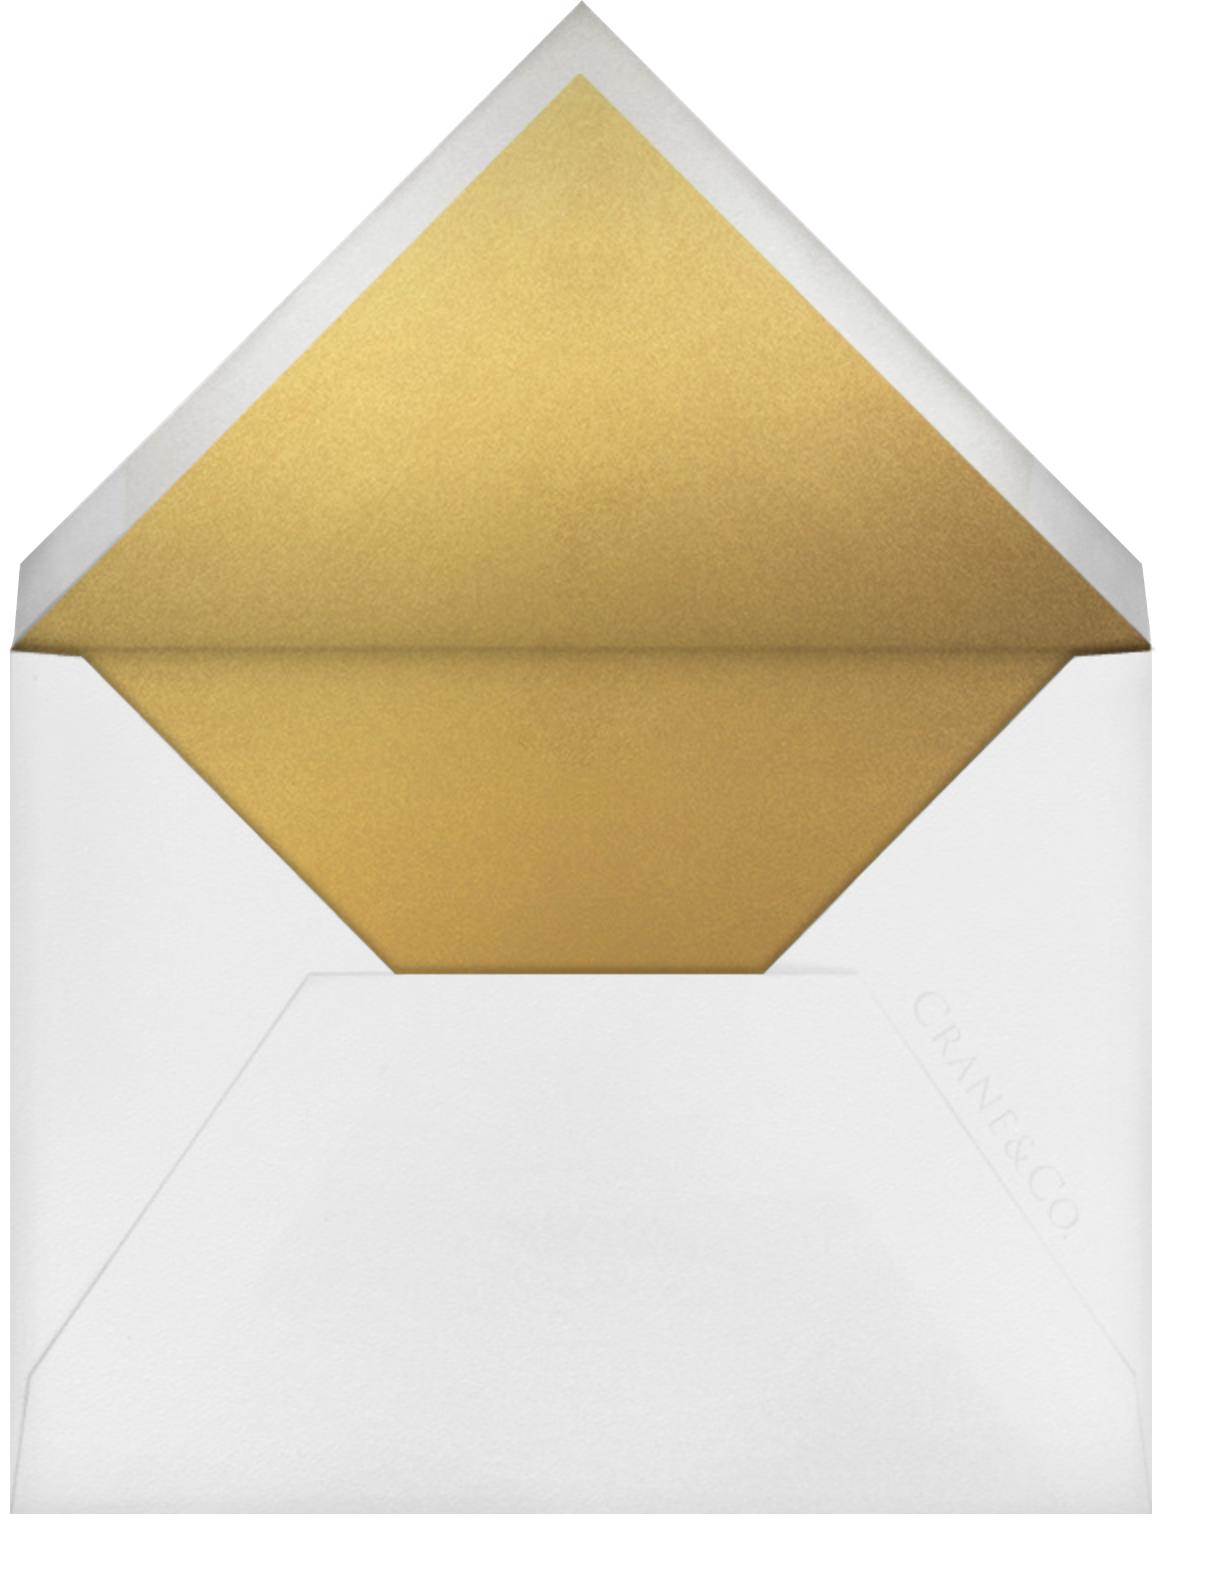 Anjou - Medium Gold - Crane & Co. - All - envelope back